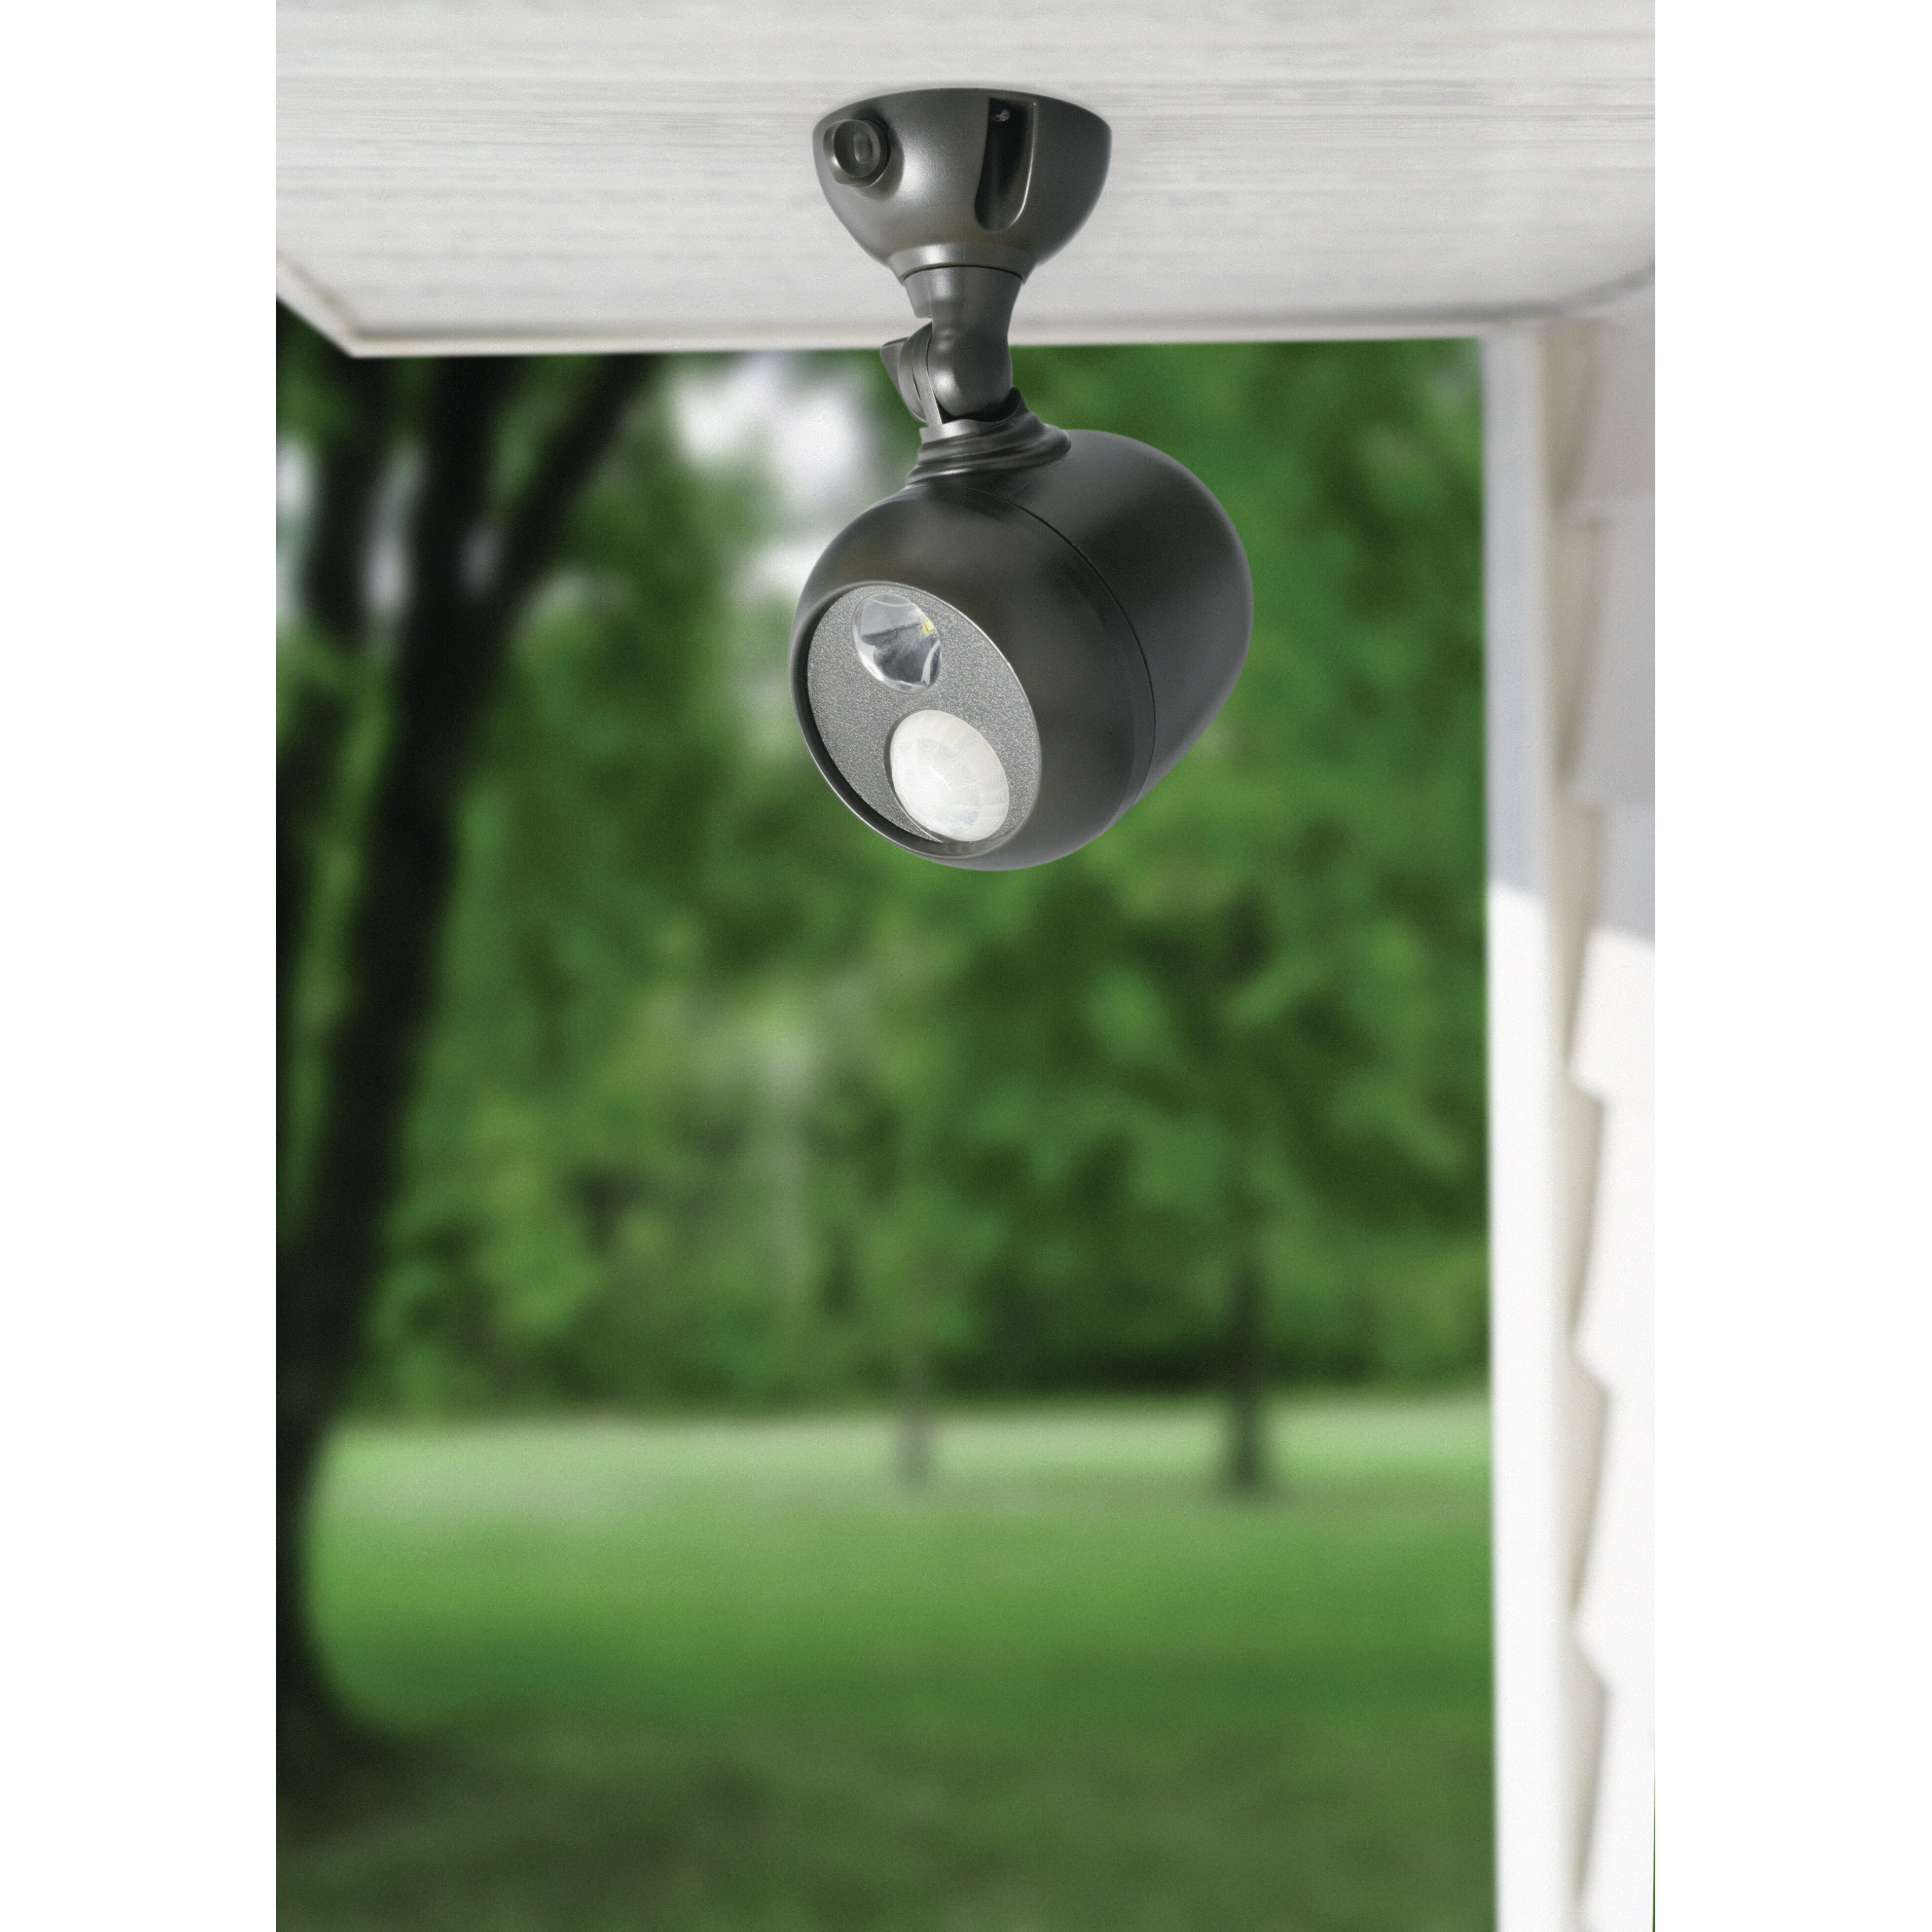 mr beams mr beams led spot light reviews wayfair. Black Bedroom Furniture Sets. Home Design Ideas